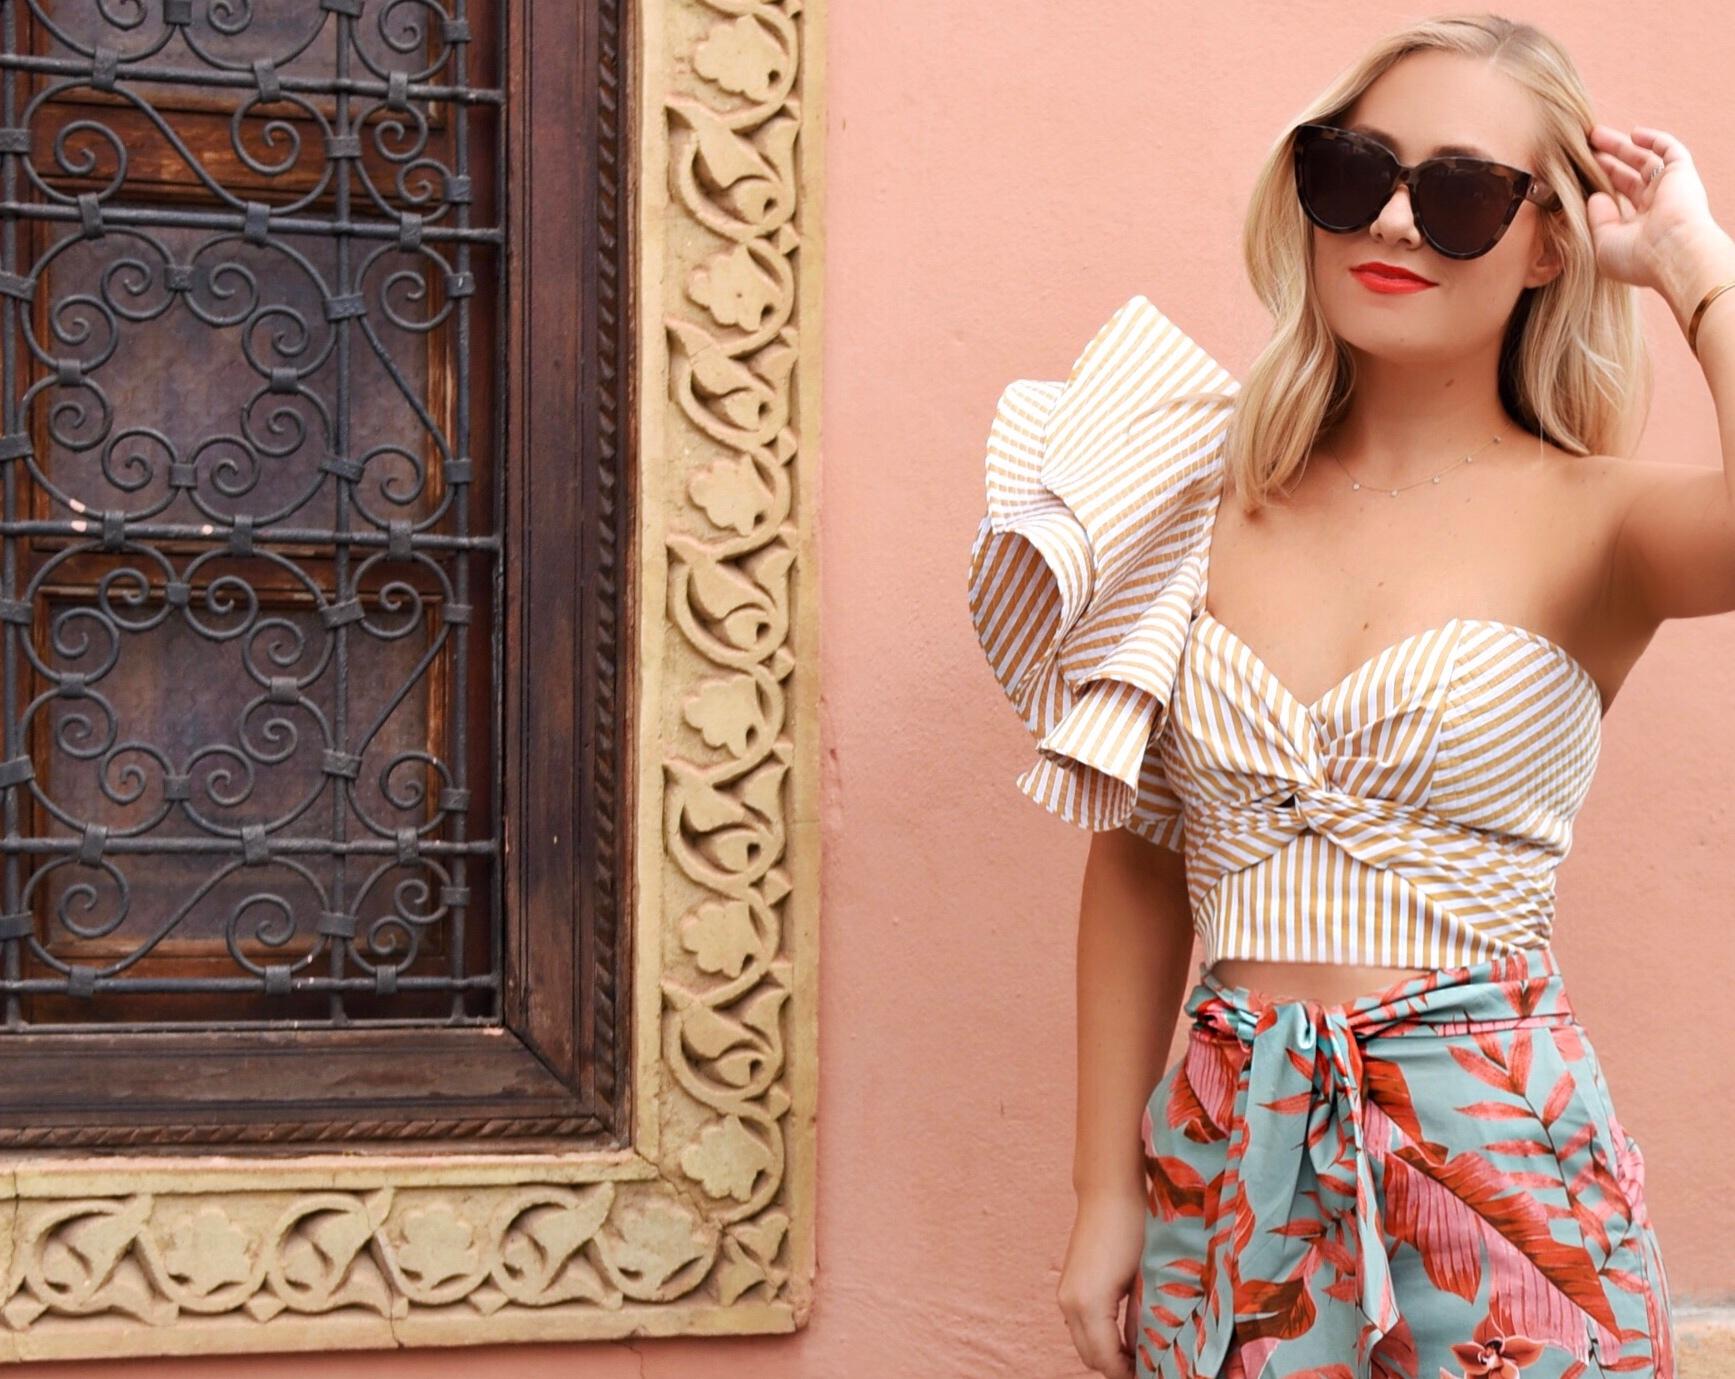 lo-murphy-johanna-ortiz-ruffle-top-printed-midi-skirt-marrakech-vacation-style